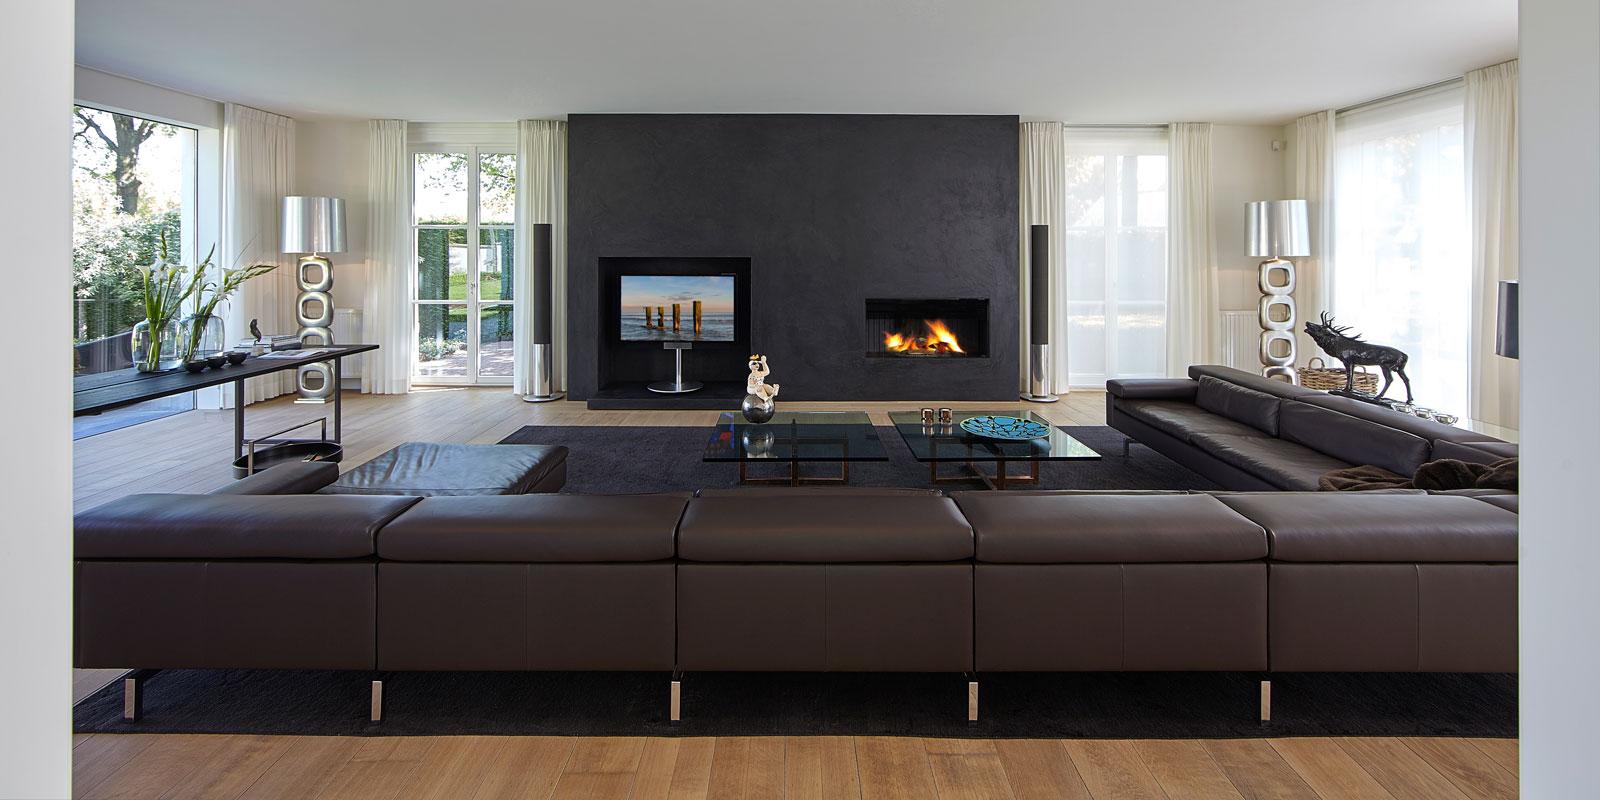 Marmeren villa, Rob Zeelen Interior